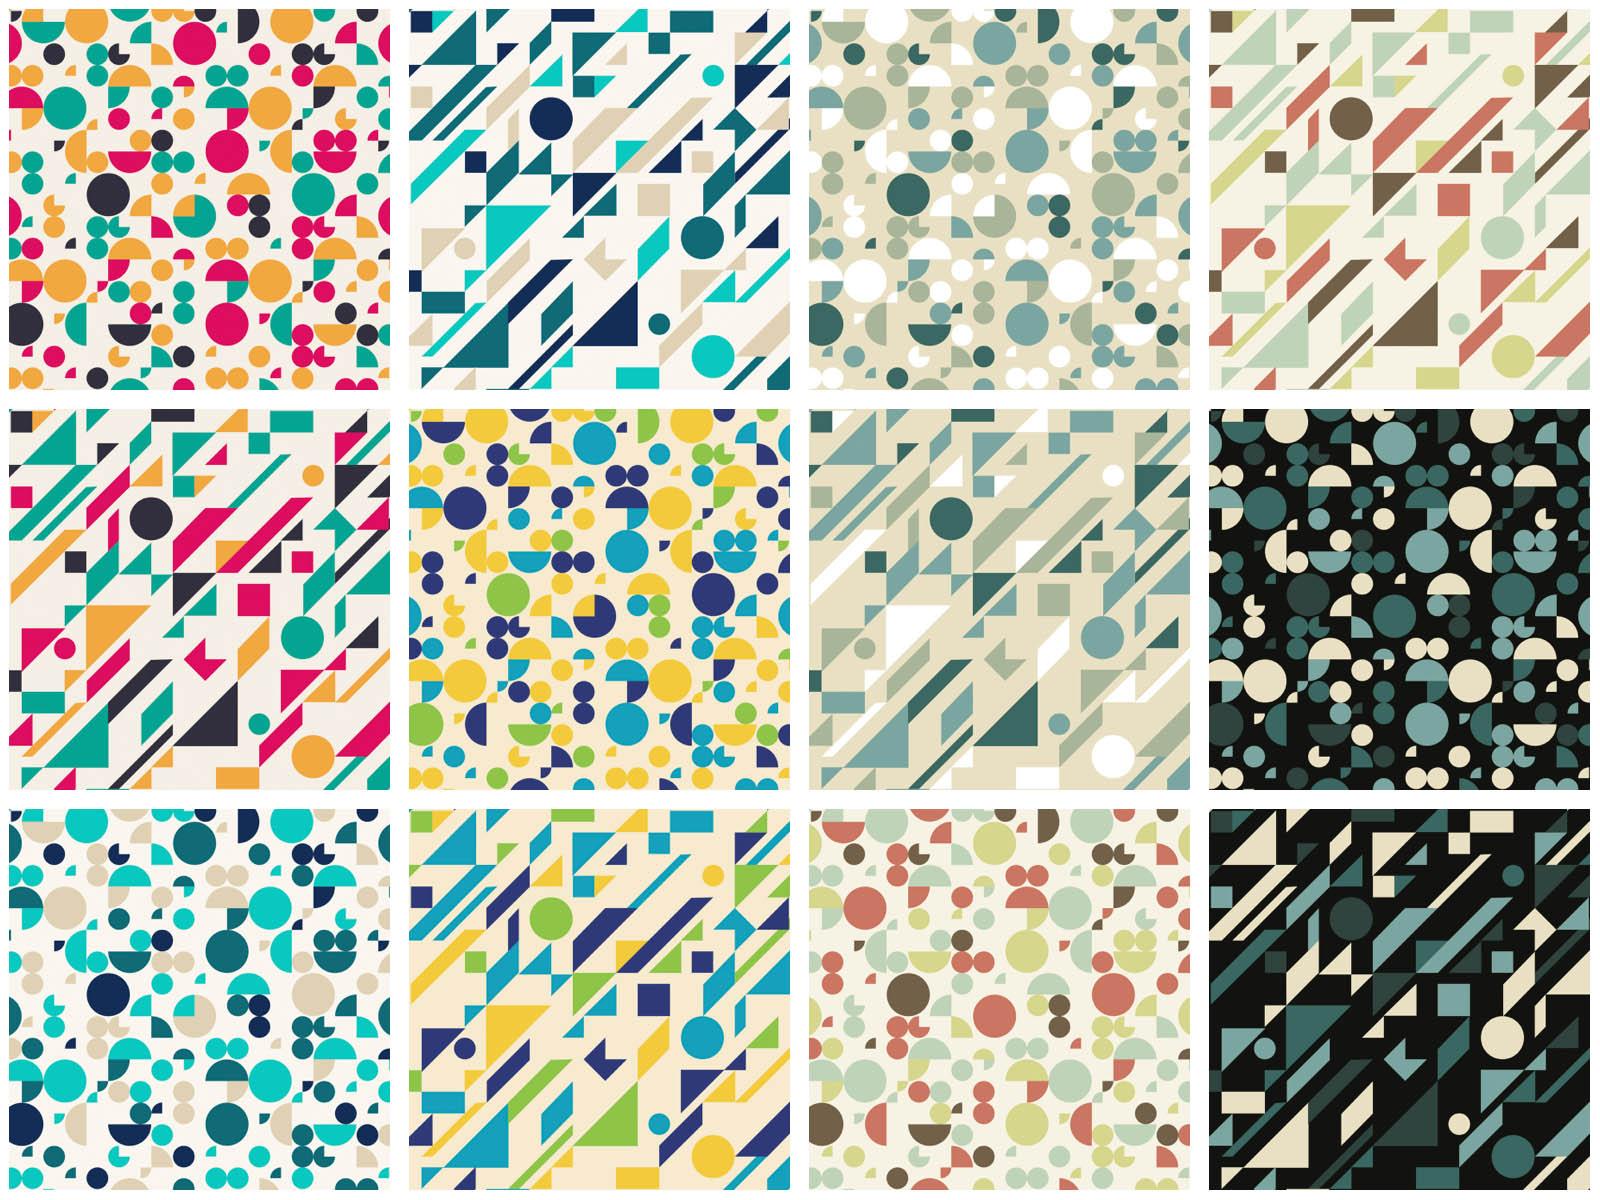 Geometric Design Patterns Vector